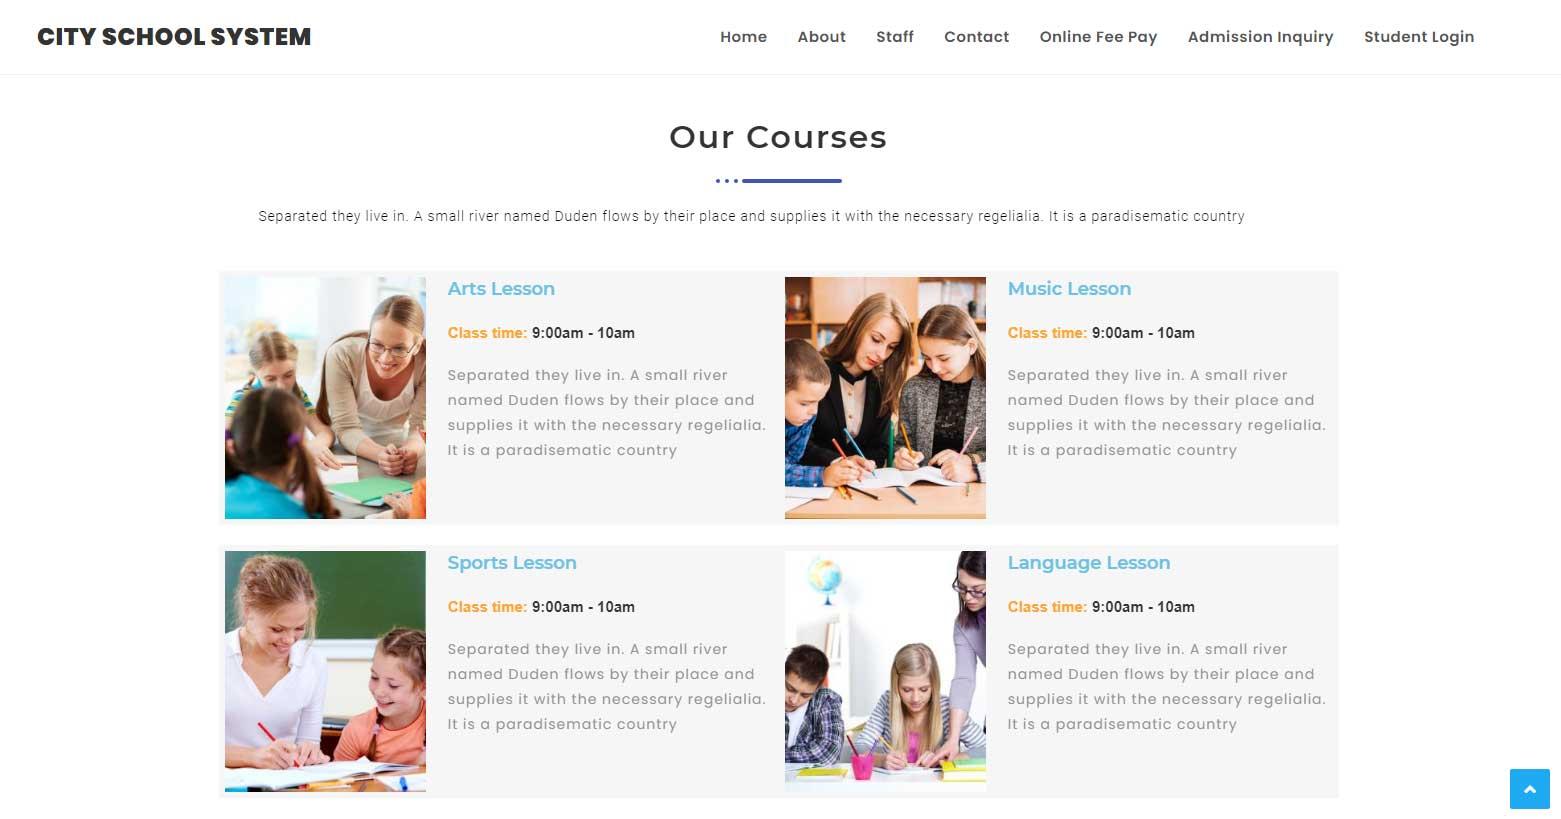 City-School-System-Course